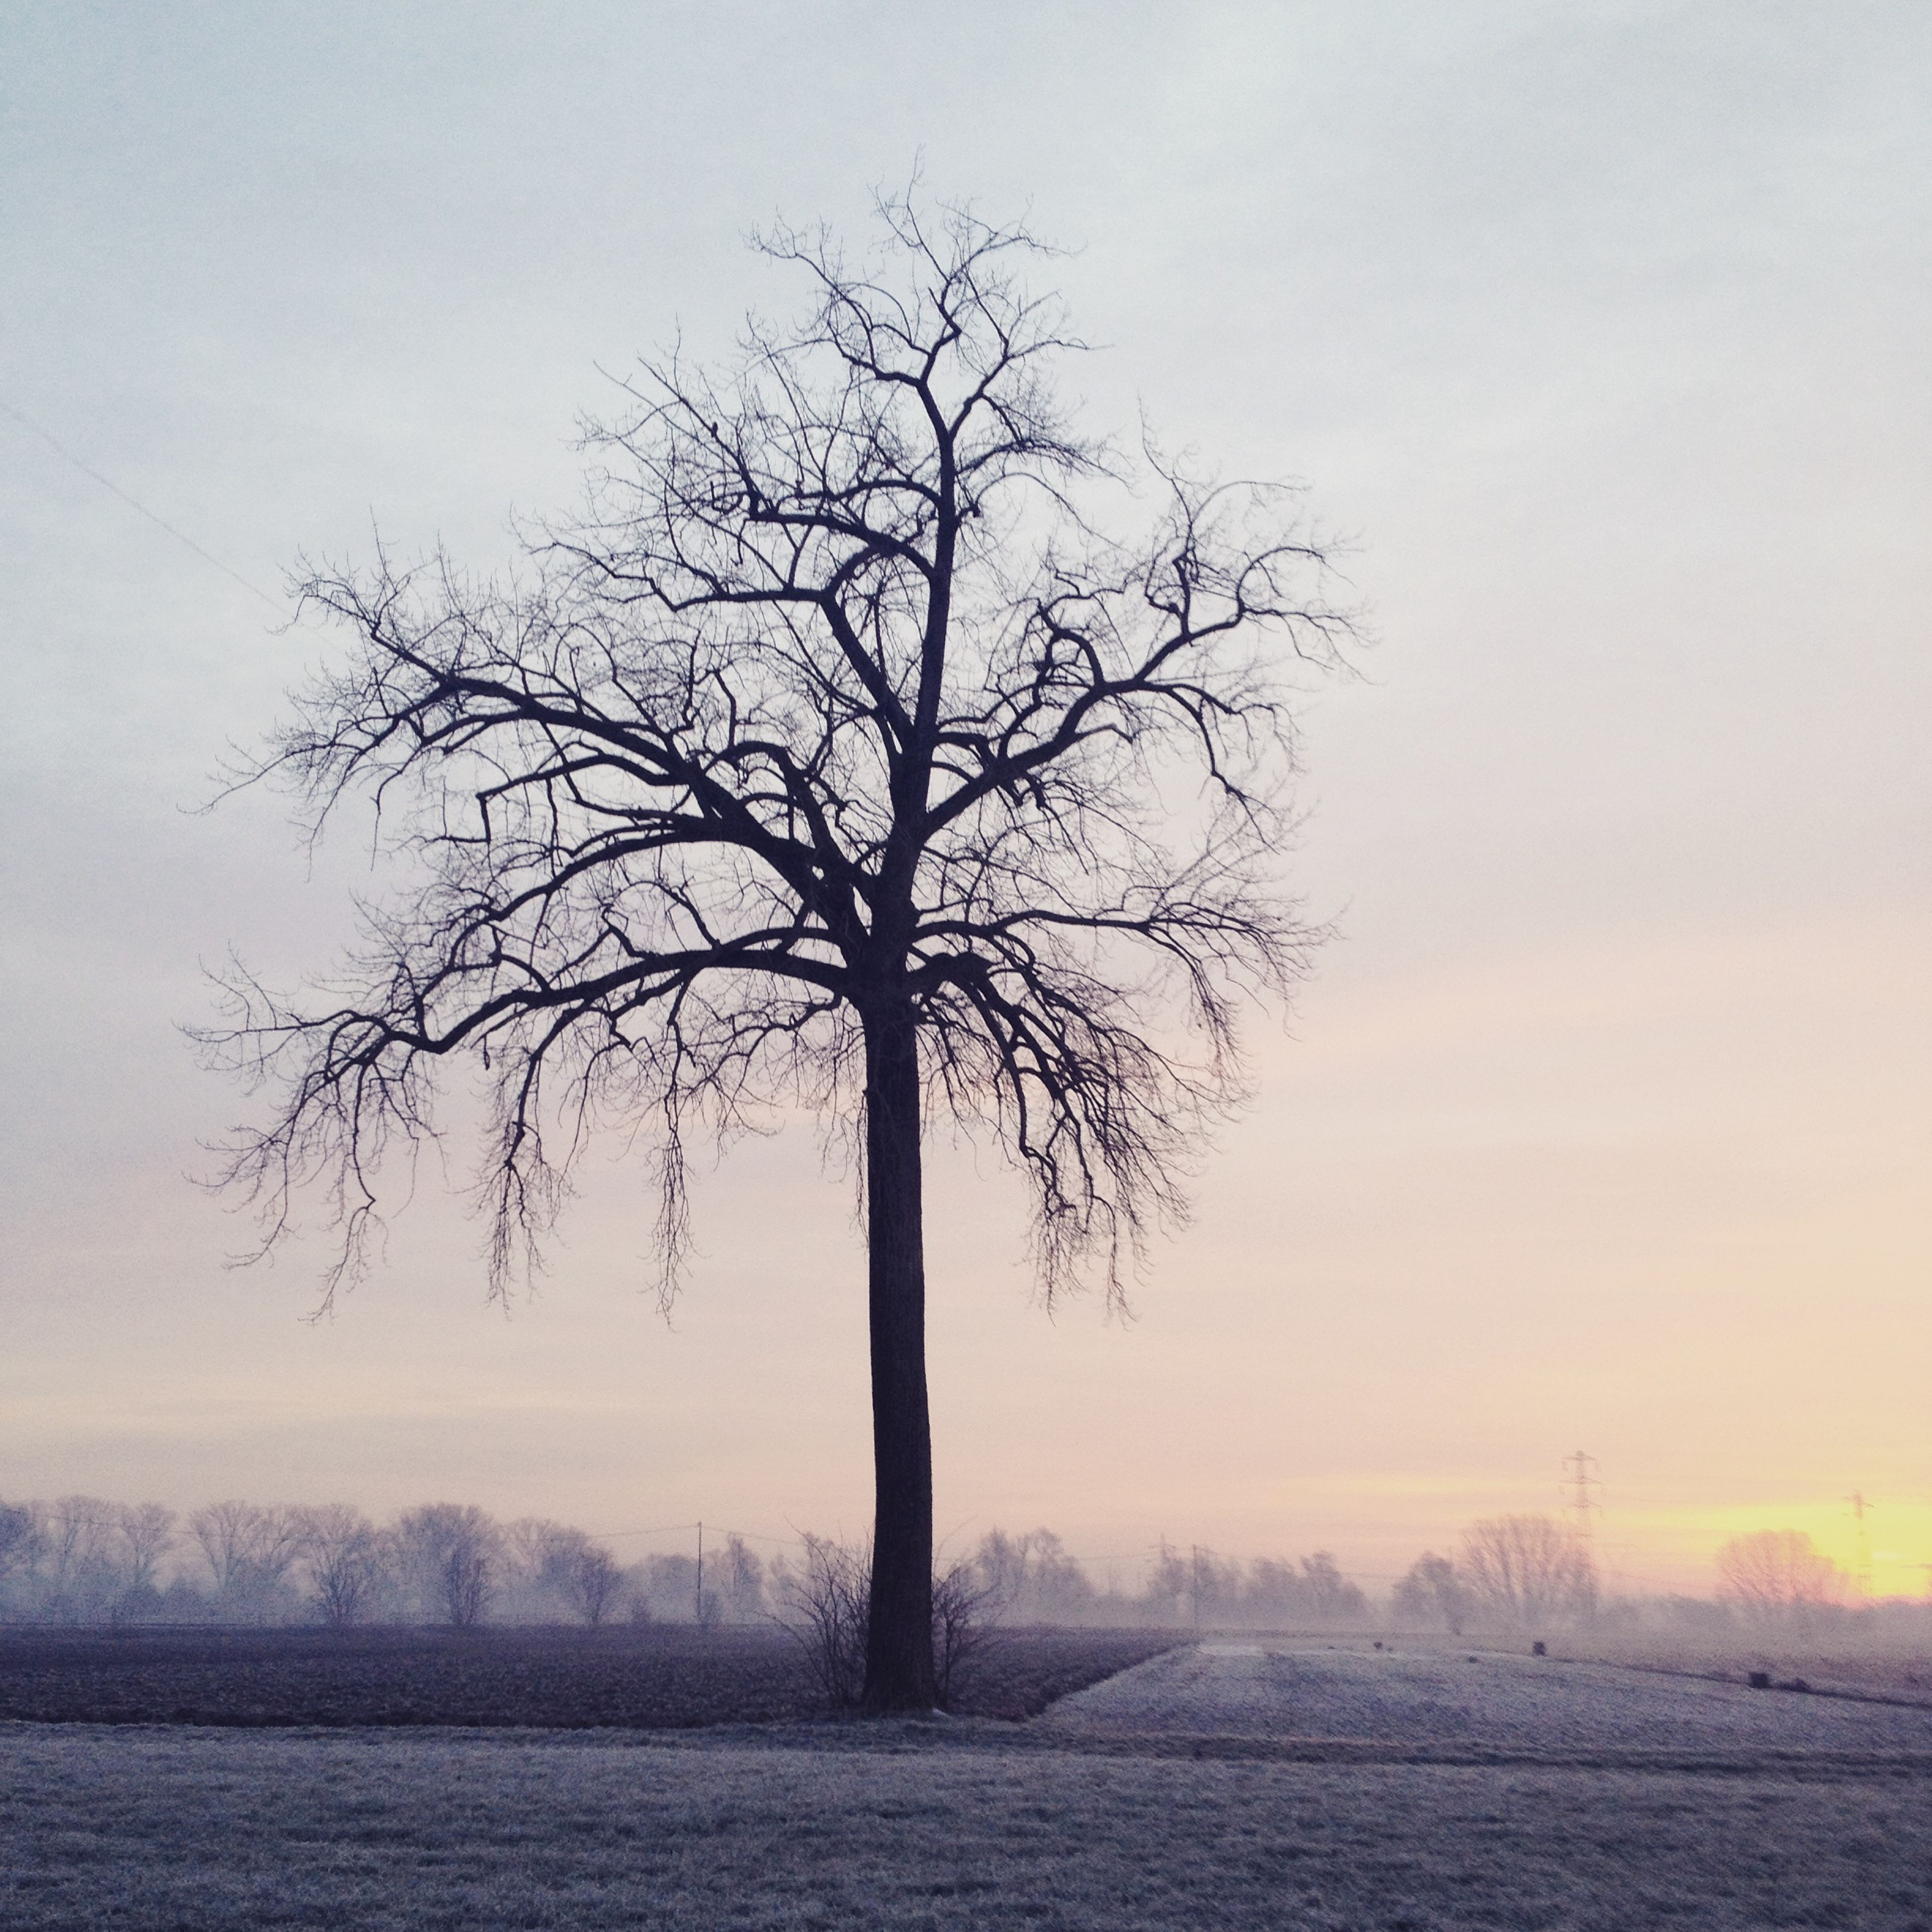 bare tree, winter, tranquility, tranquil scene, tree, cold temperature, snow, scenics, landscape, beauty in nature, nature, weather, field, tree trunk, branch, season, sky, non-urban scene, silhouette, single tree